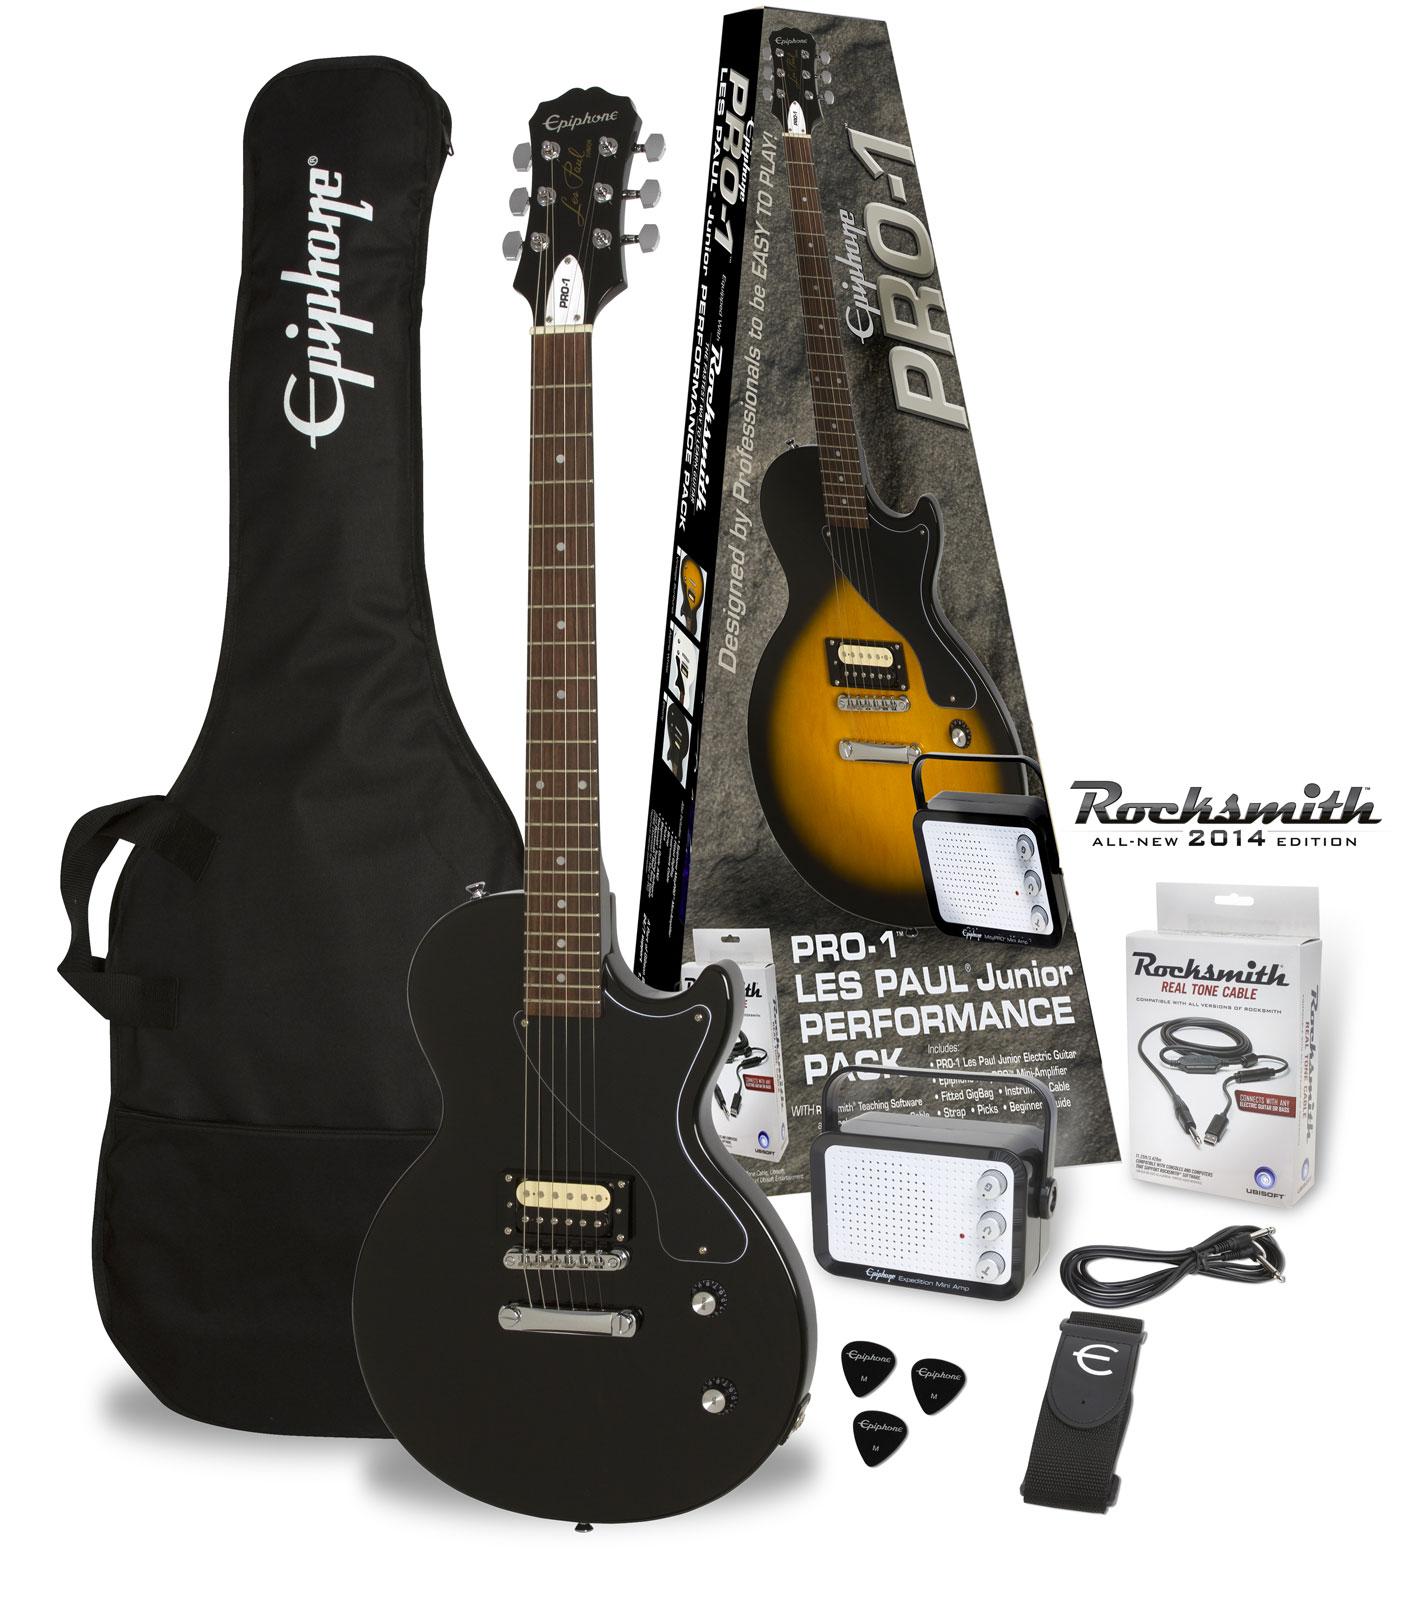 Epiphone Pro-1 Les Paul Jr. Rocksmith Pack Ebony